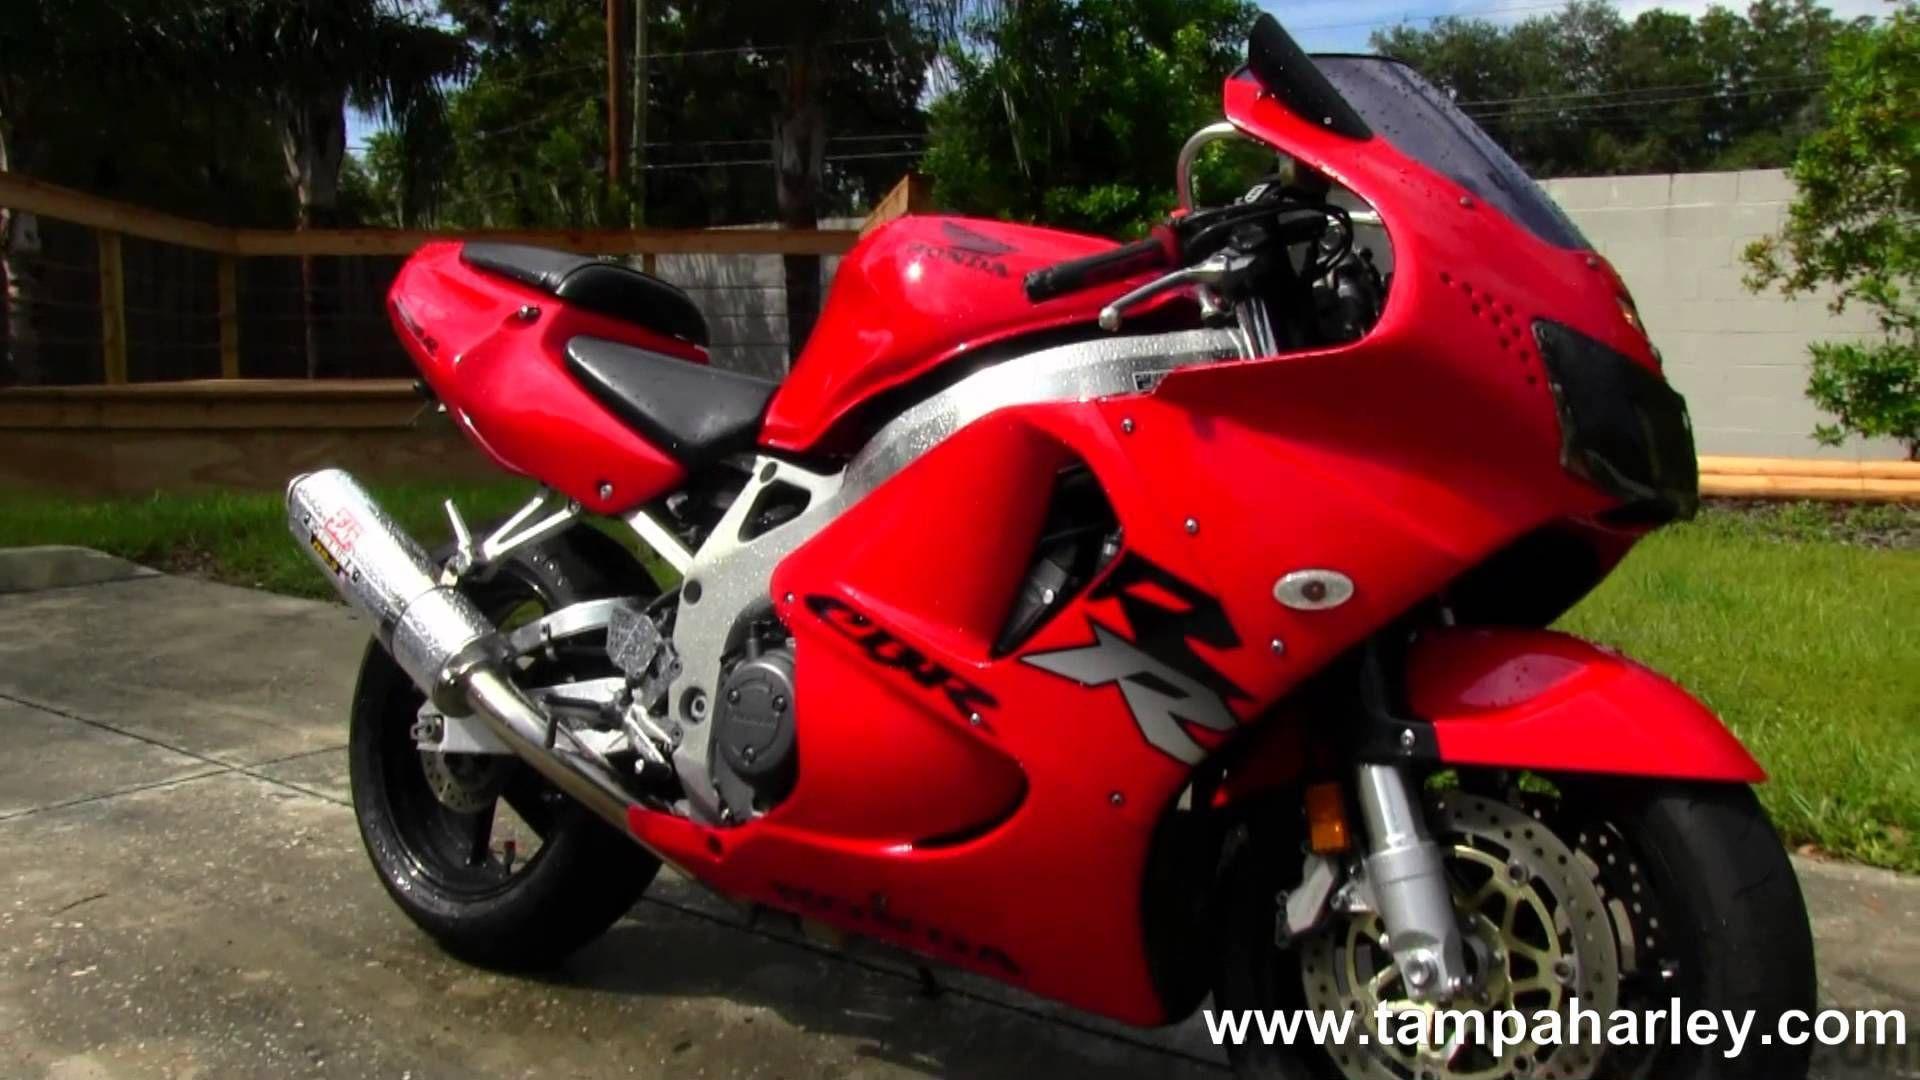 Used Honda Motorcycles for sale CBR900RR Sport bike for